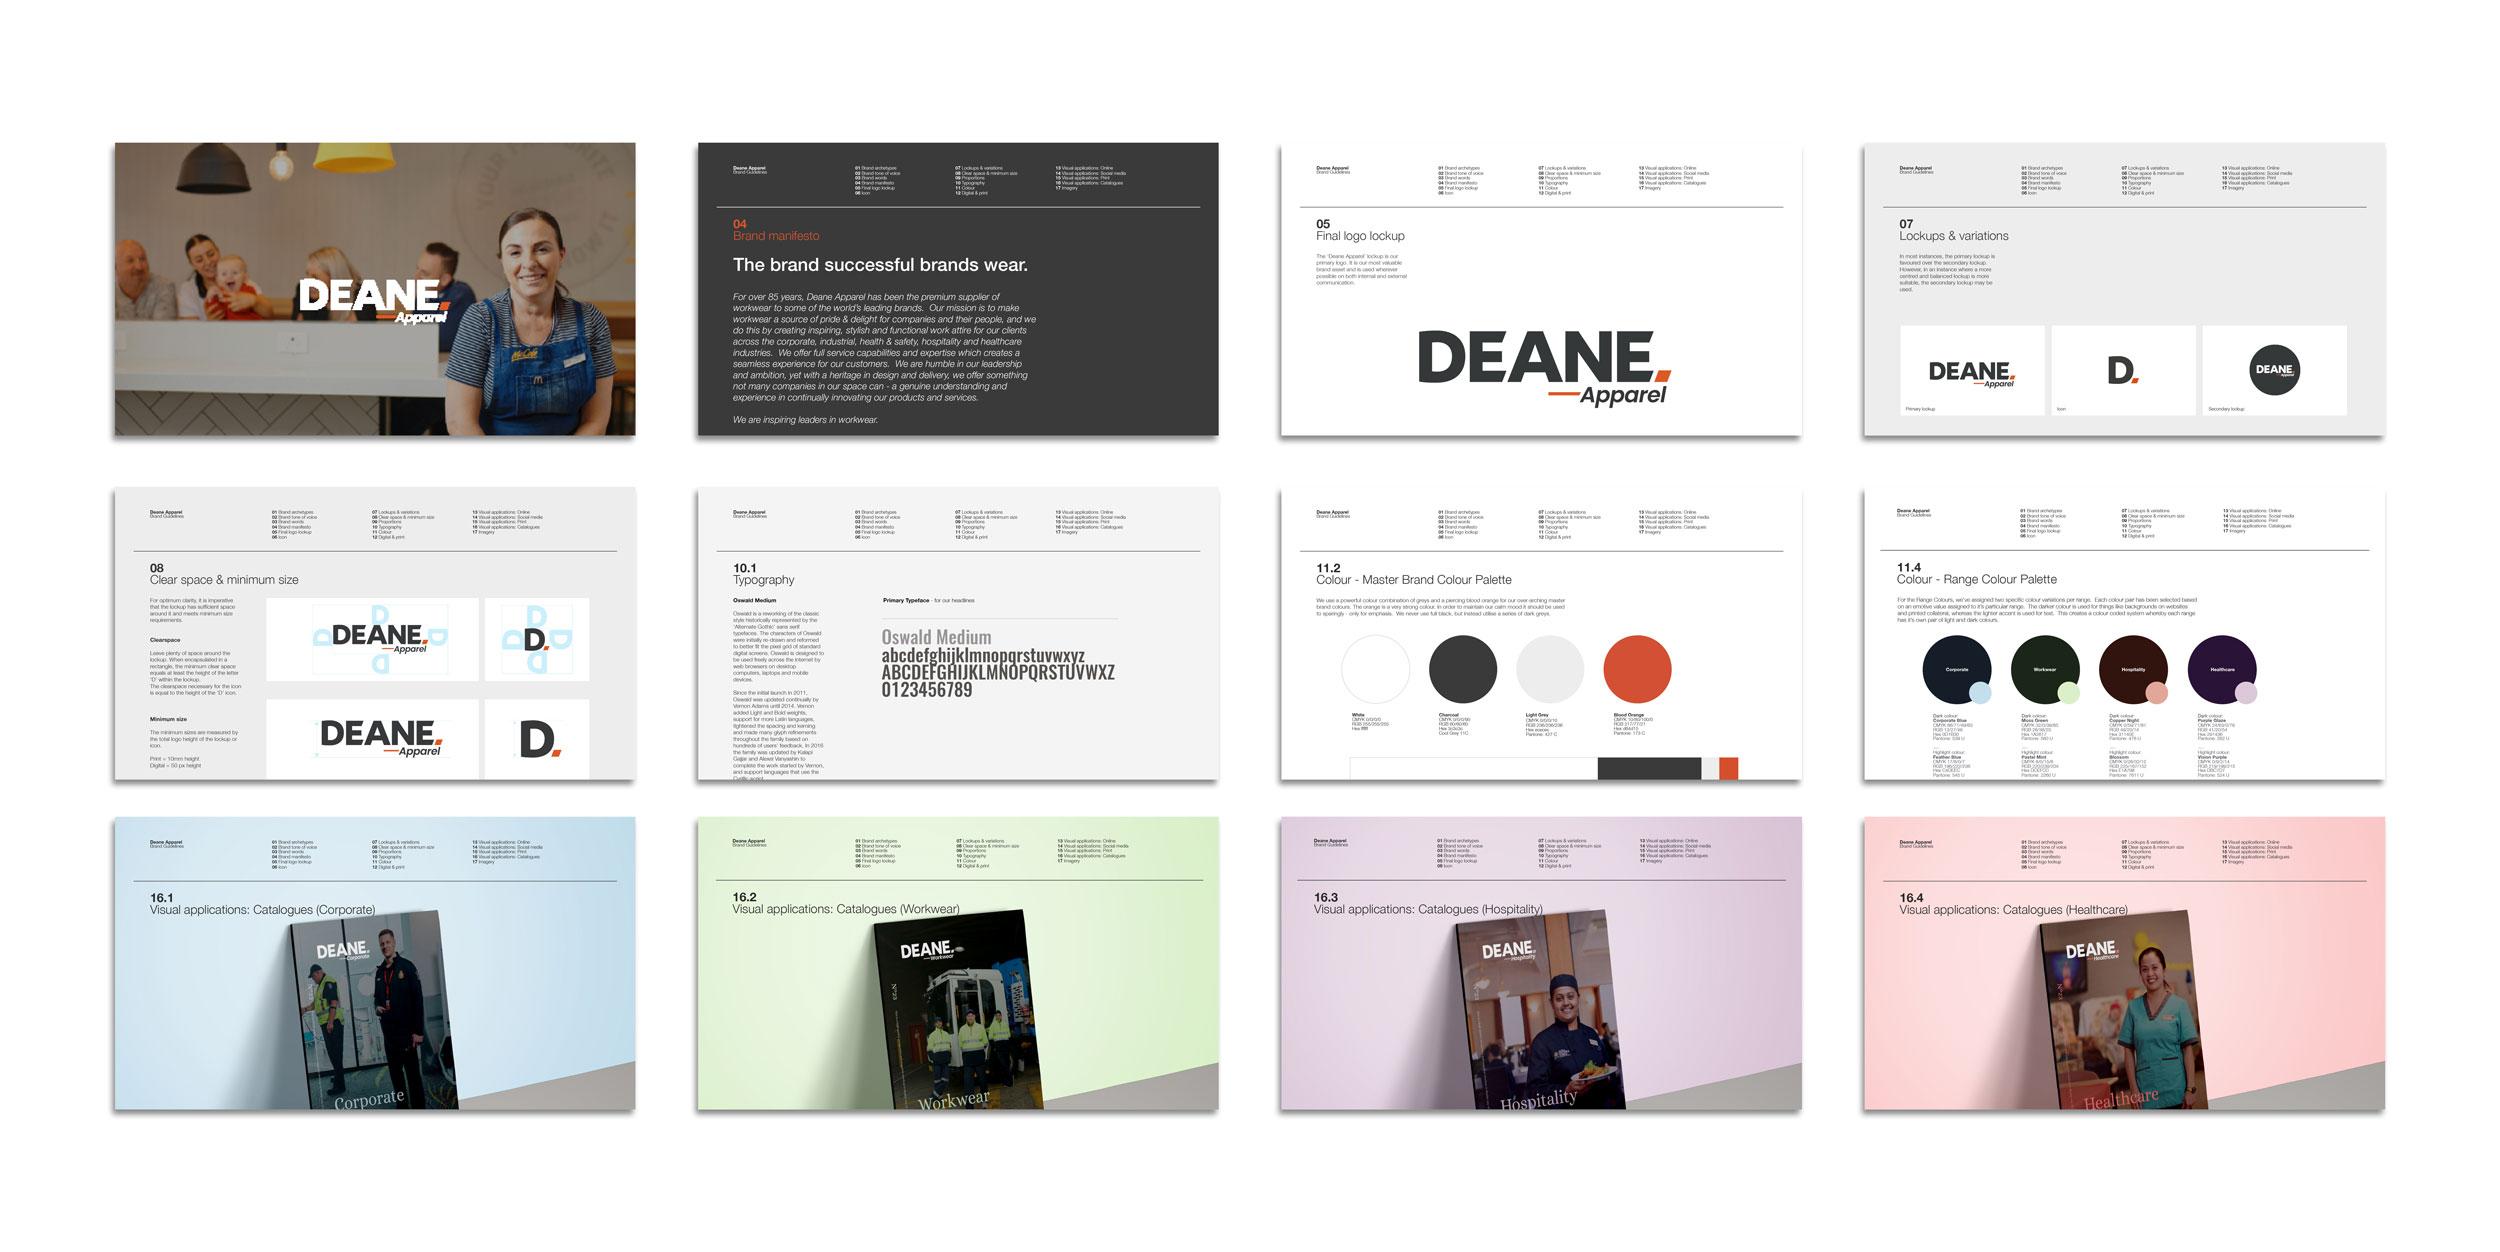 Deane_Guidelines_Summary.jpg